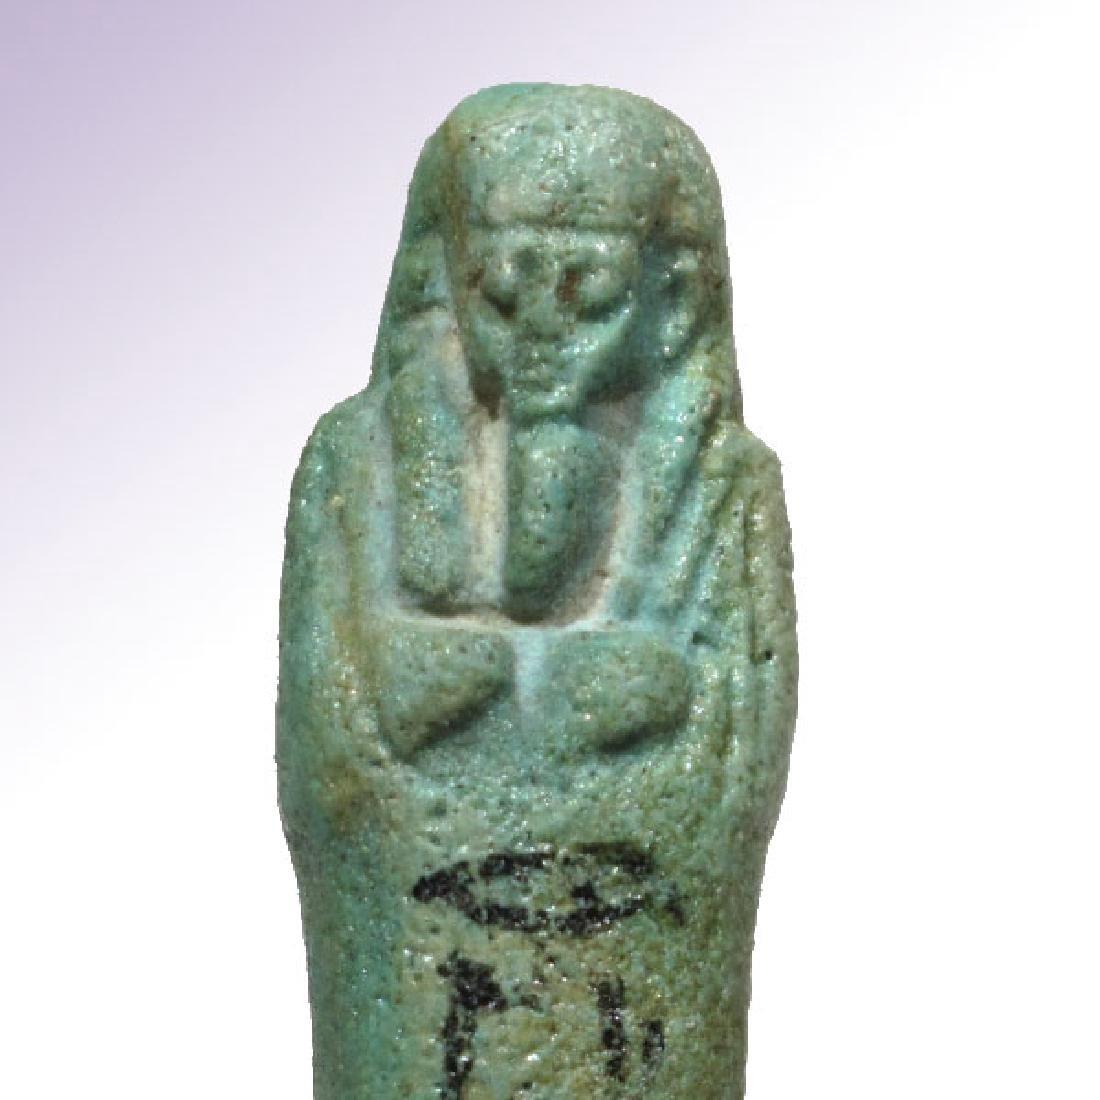 Egyptian Inscribed Faience Shabti of KA NEFER, c. - 3